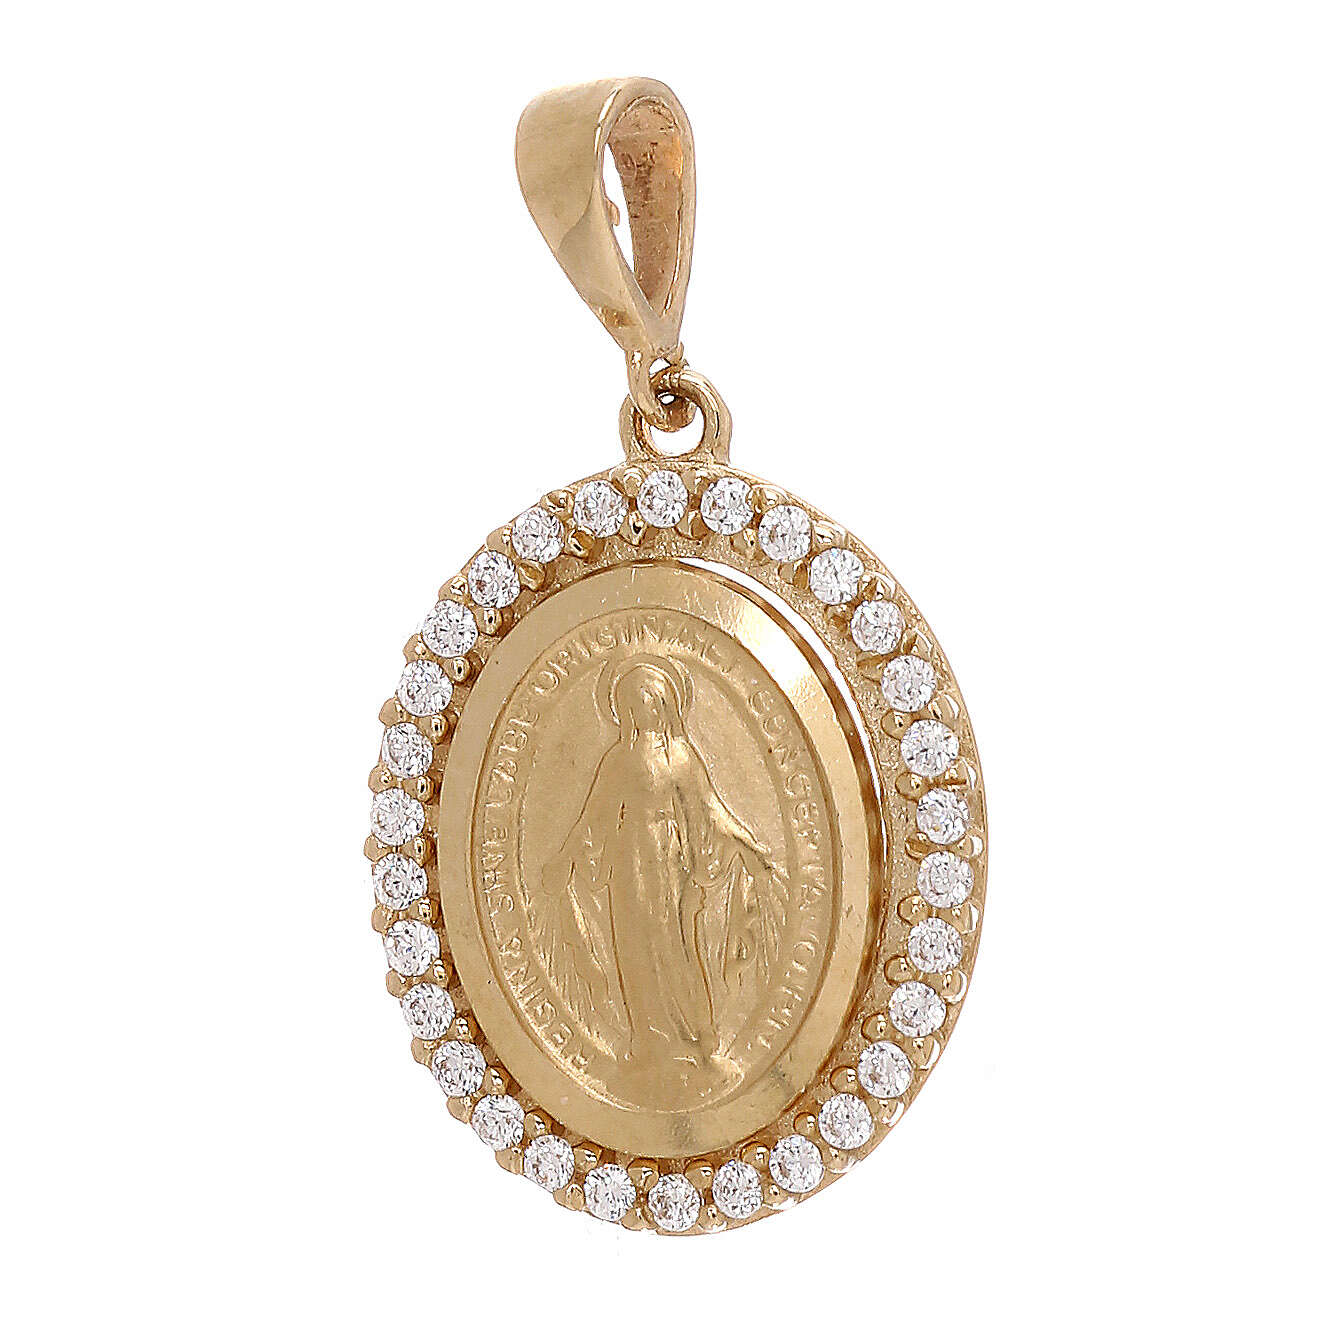 Colgante Medalla Milagrosa oro amarillo Swarovski 2,6 gramos 4